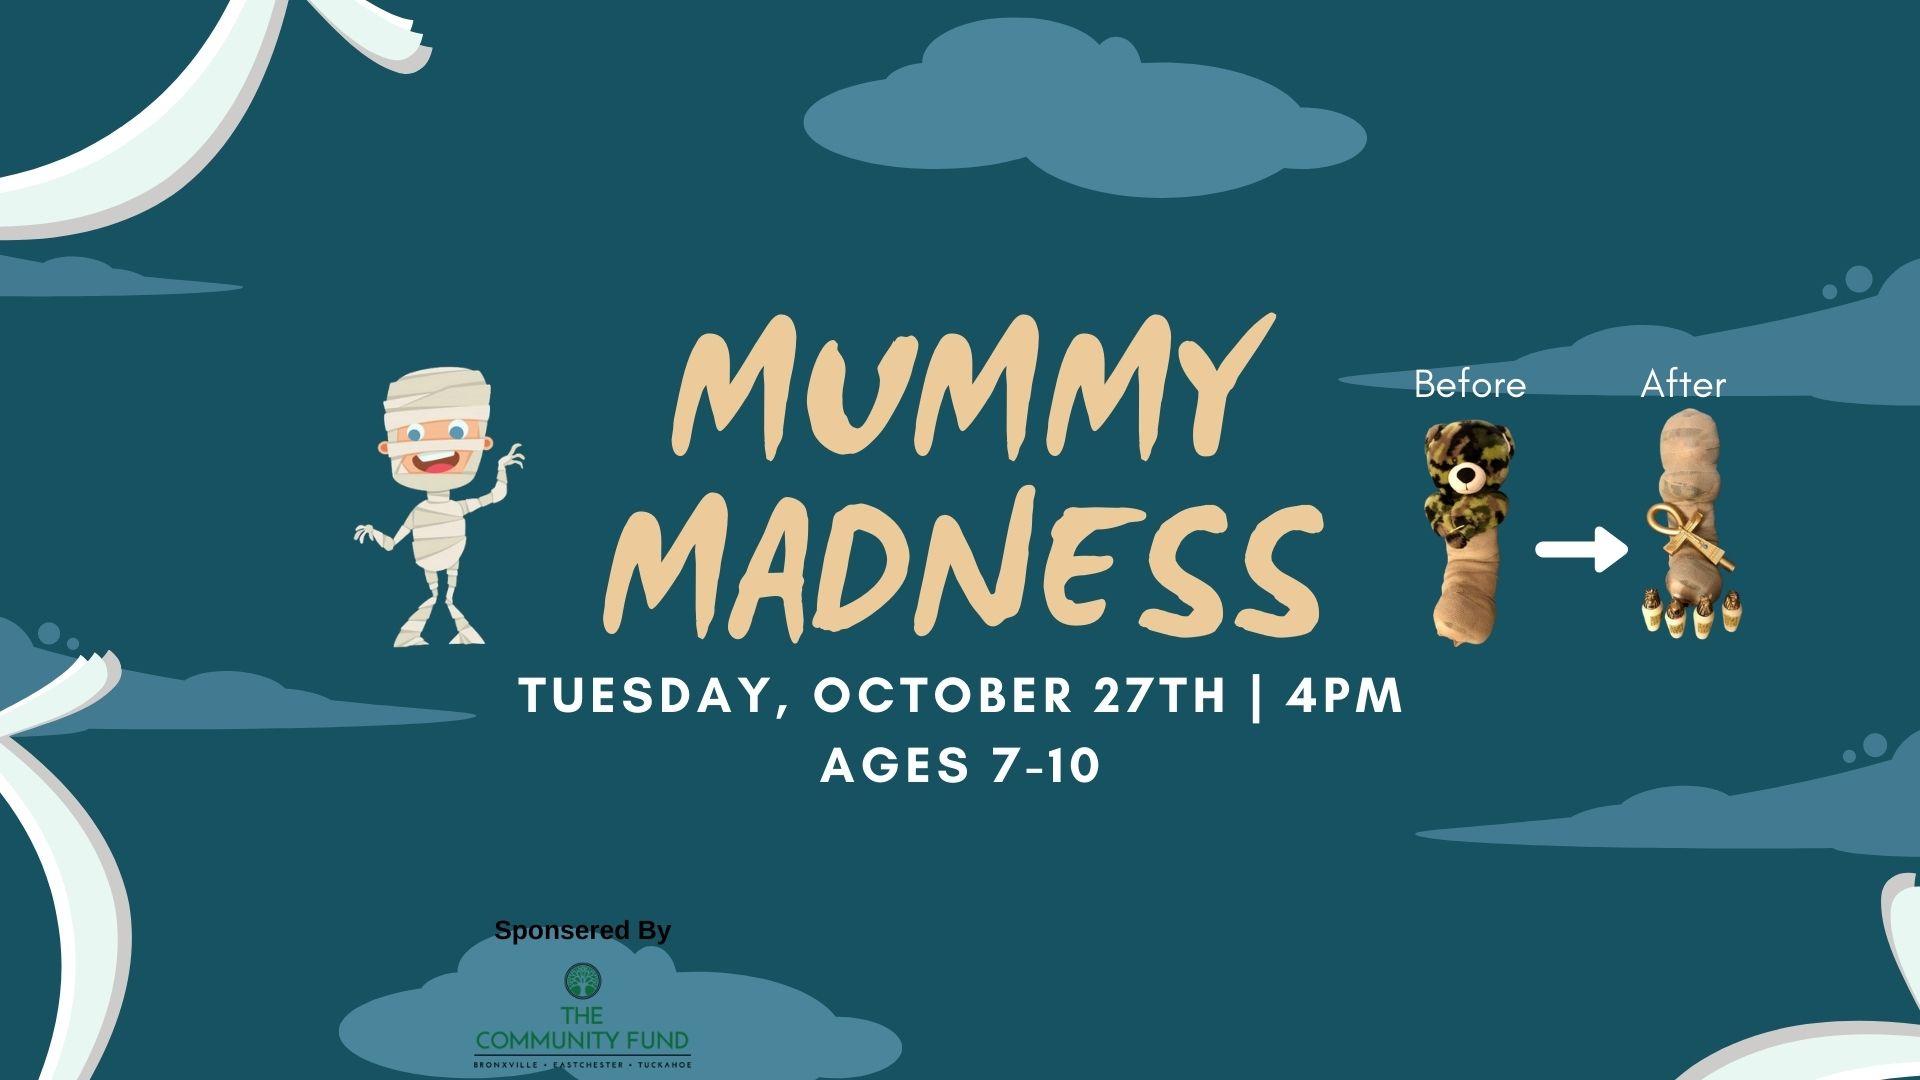 Mummy Madness, Ages 7-10